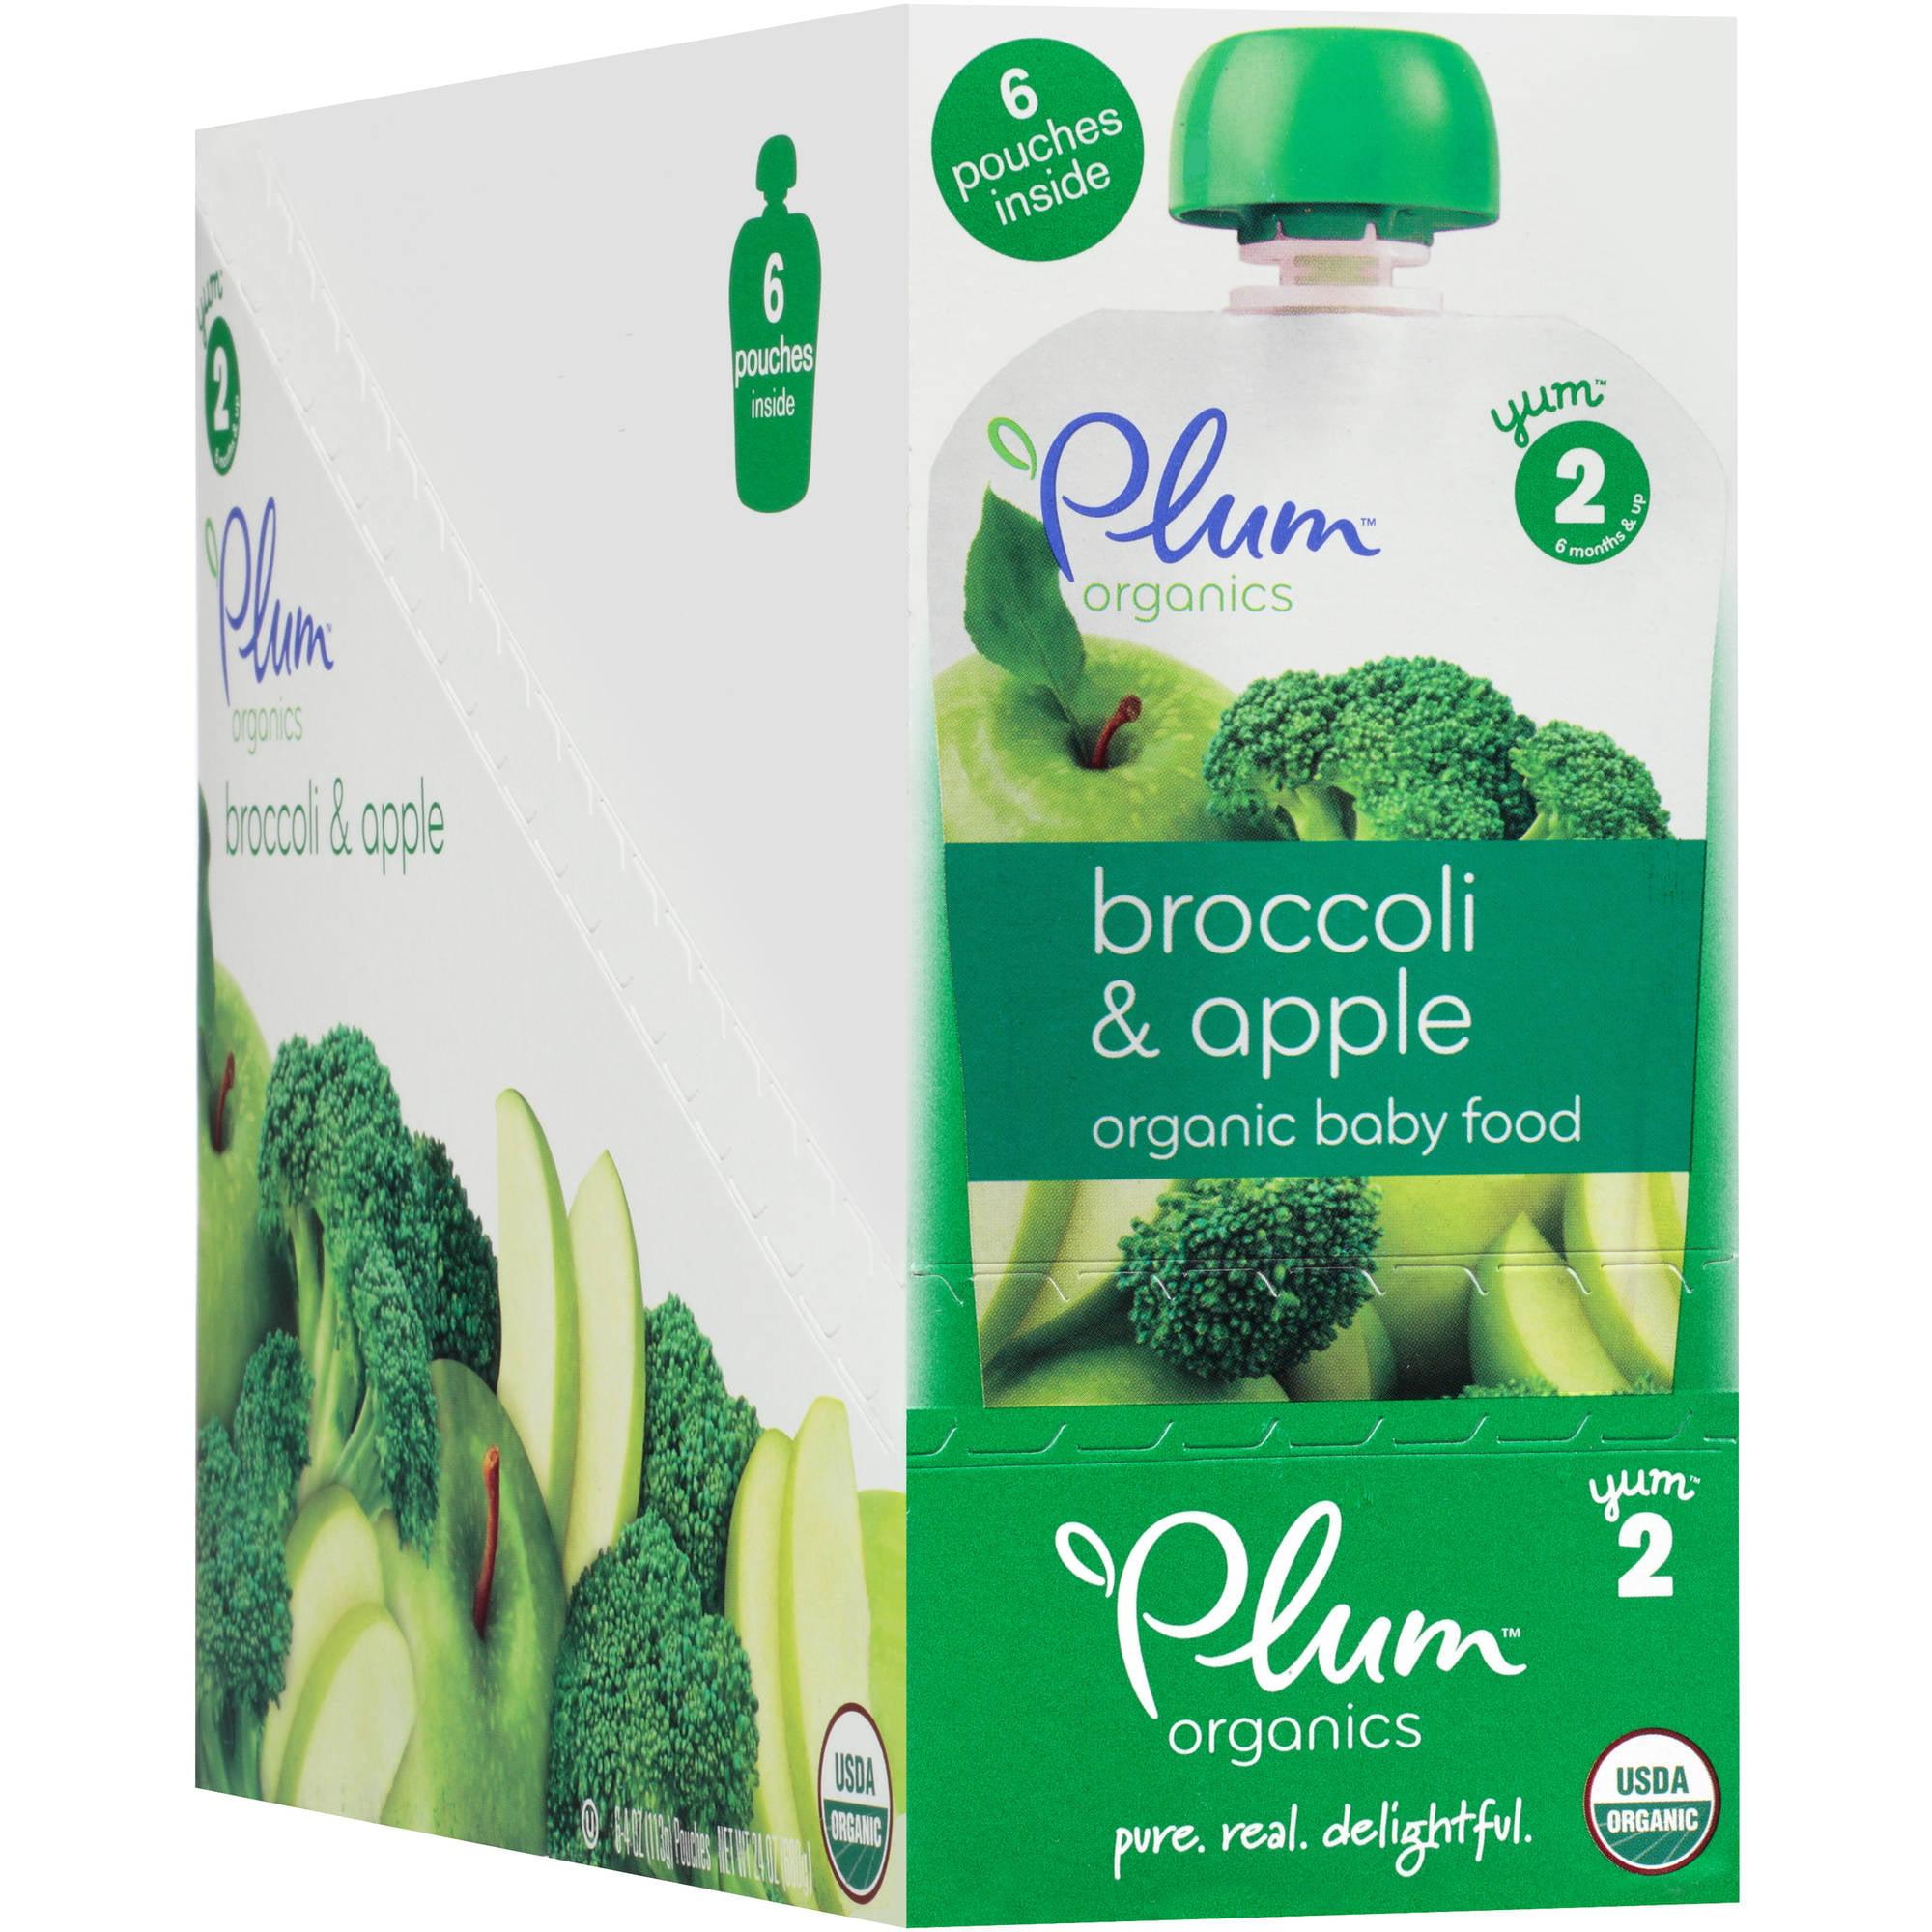 Plum Organics Stage 2 Broccoli & Apple Organic Baby Food, 4 oz, 6 count by Plum Organics